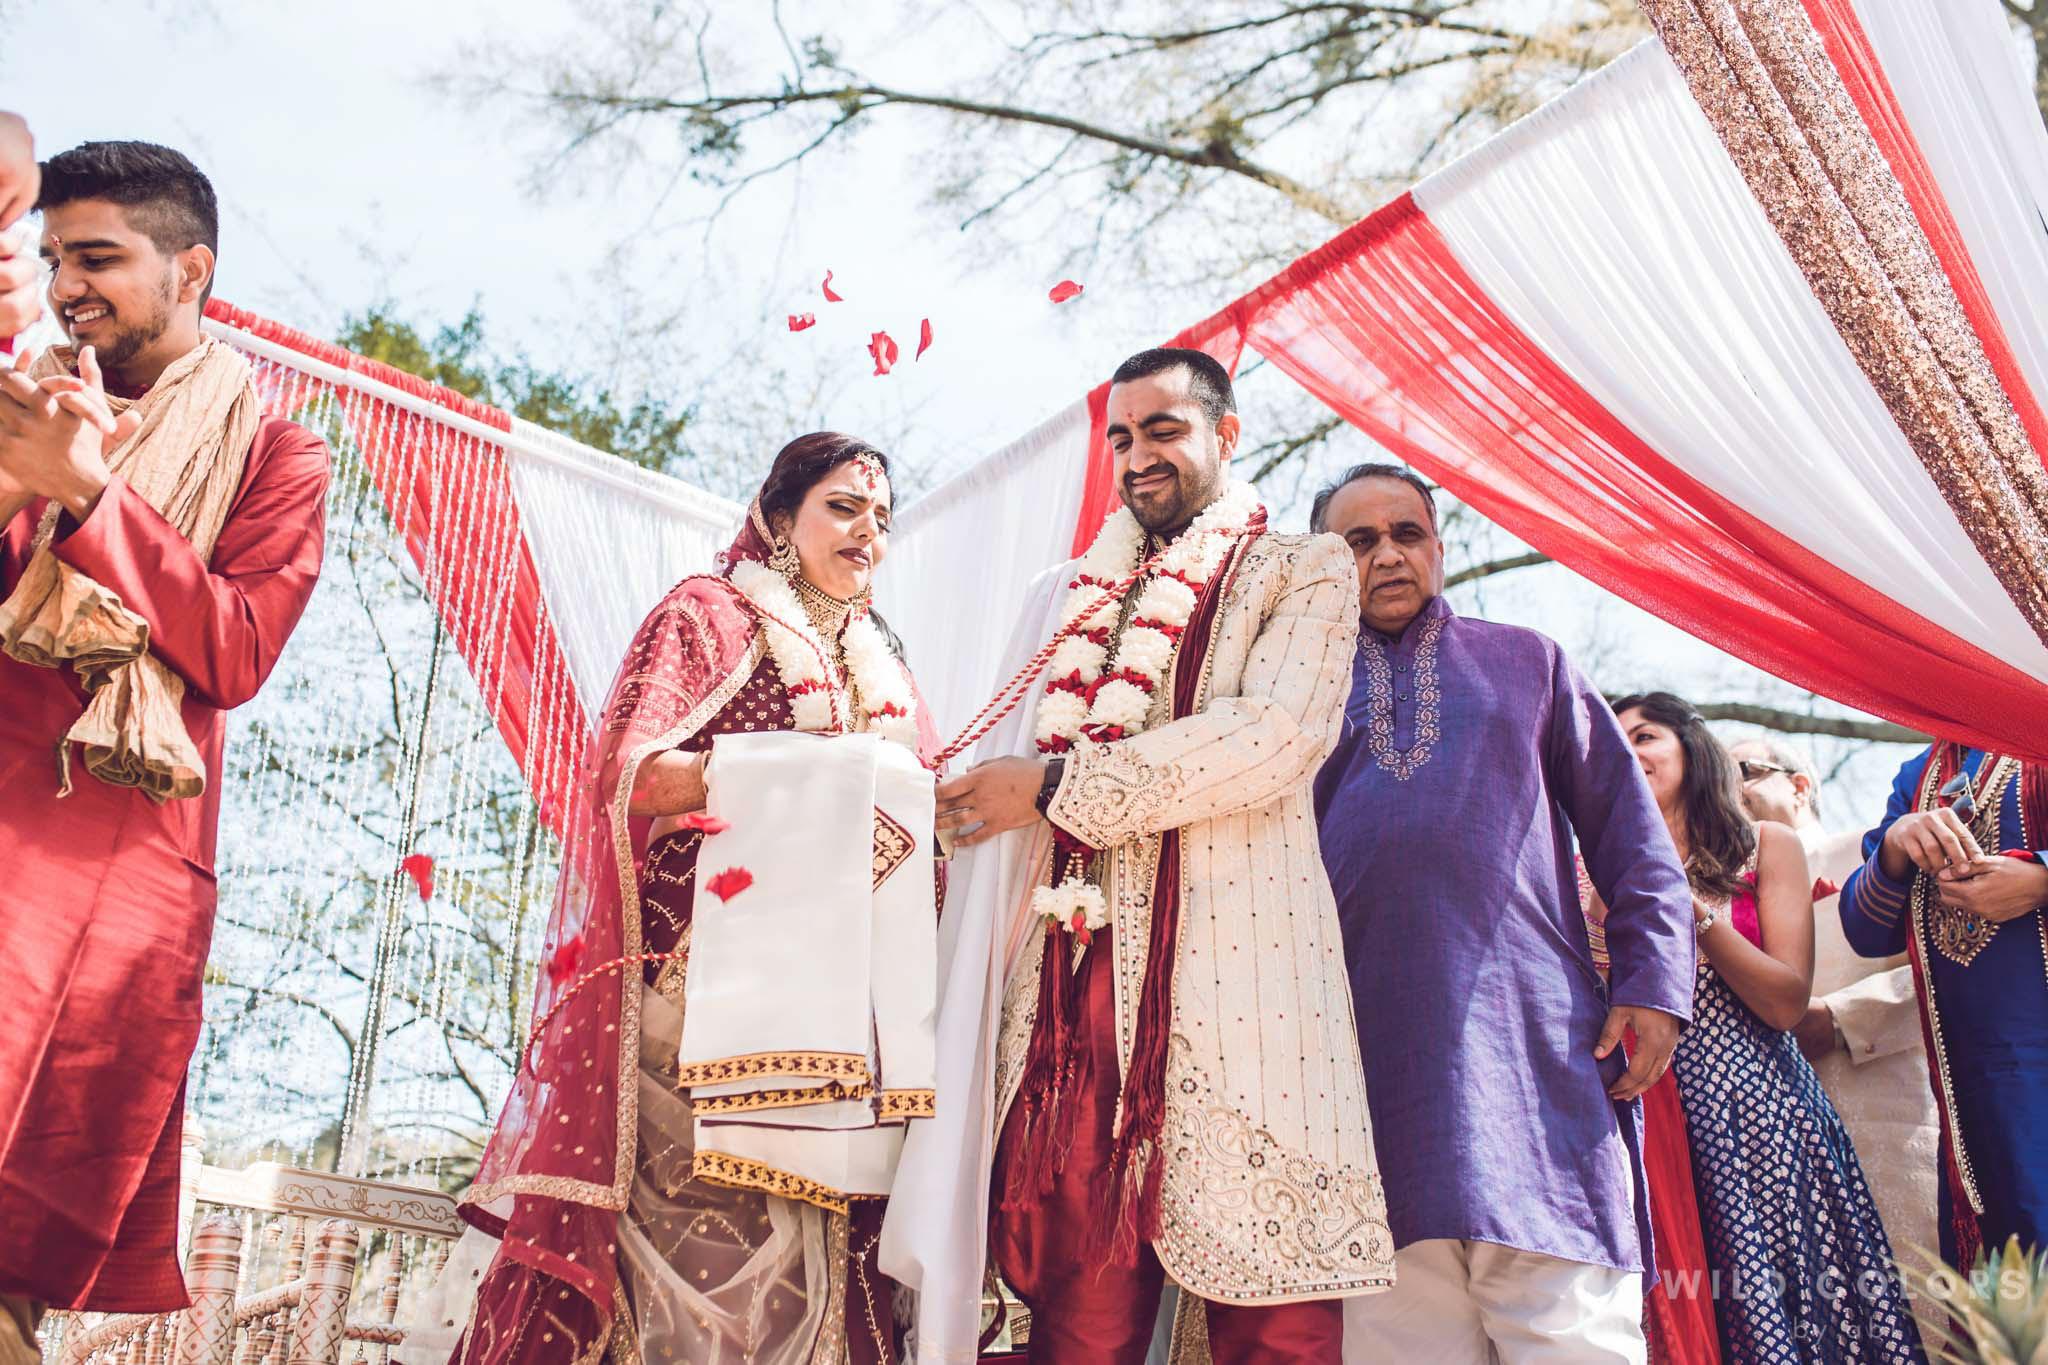 CANDID_INDIAN_WEDDING_ATLANTA_PHOTOGRAPHER-56.JPG